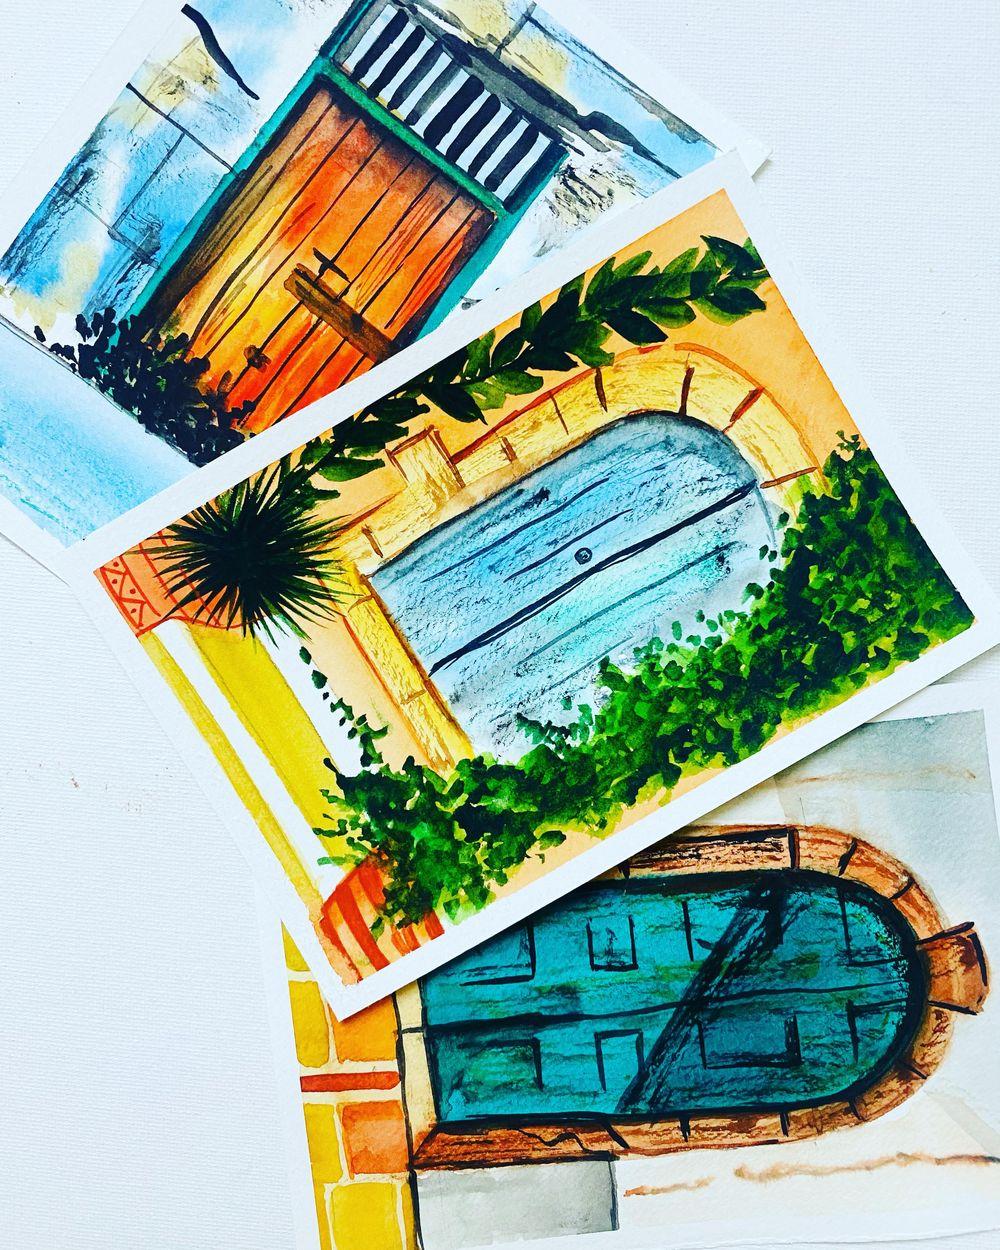 vintage doors - image 2 - student project